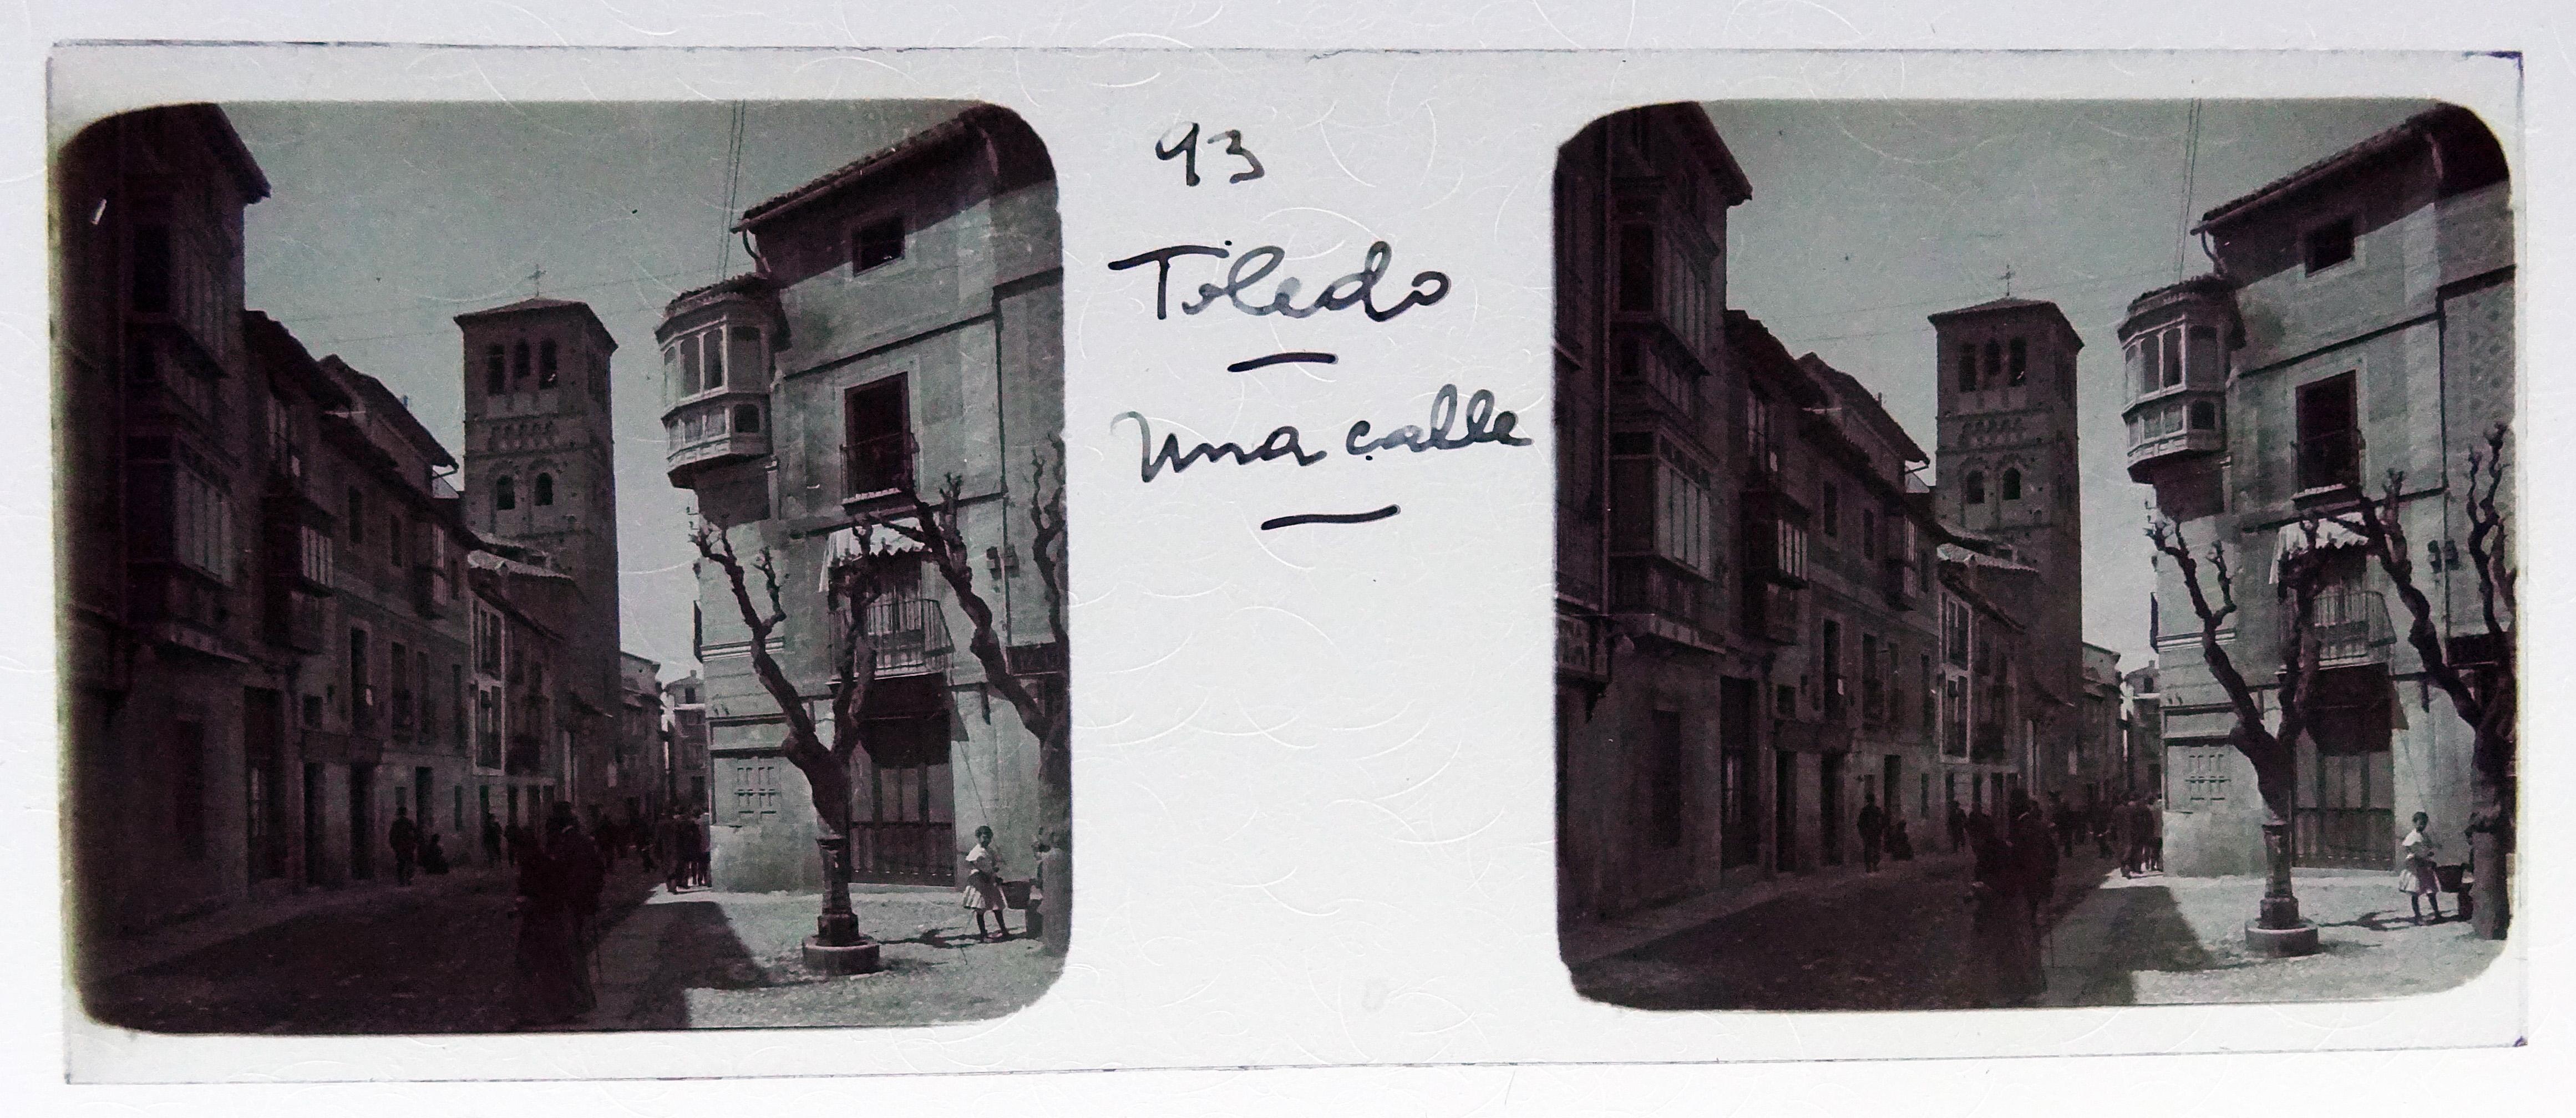 Calle de Santo Tomé. Fotografía de Francisco Rodríguez Avial hacia 1910 © Herederos de Francisco Rodríguez Avial